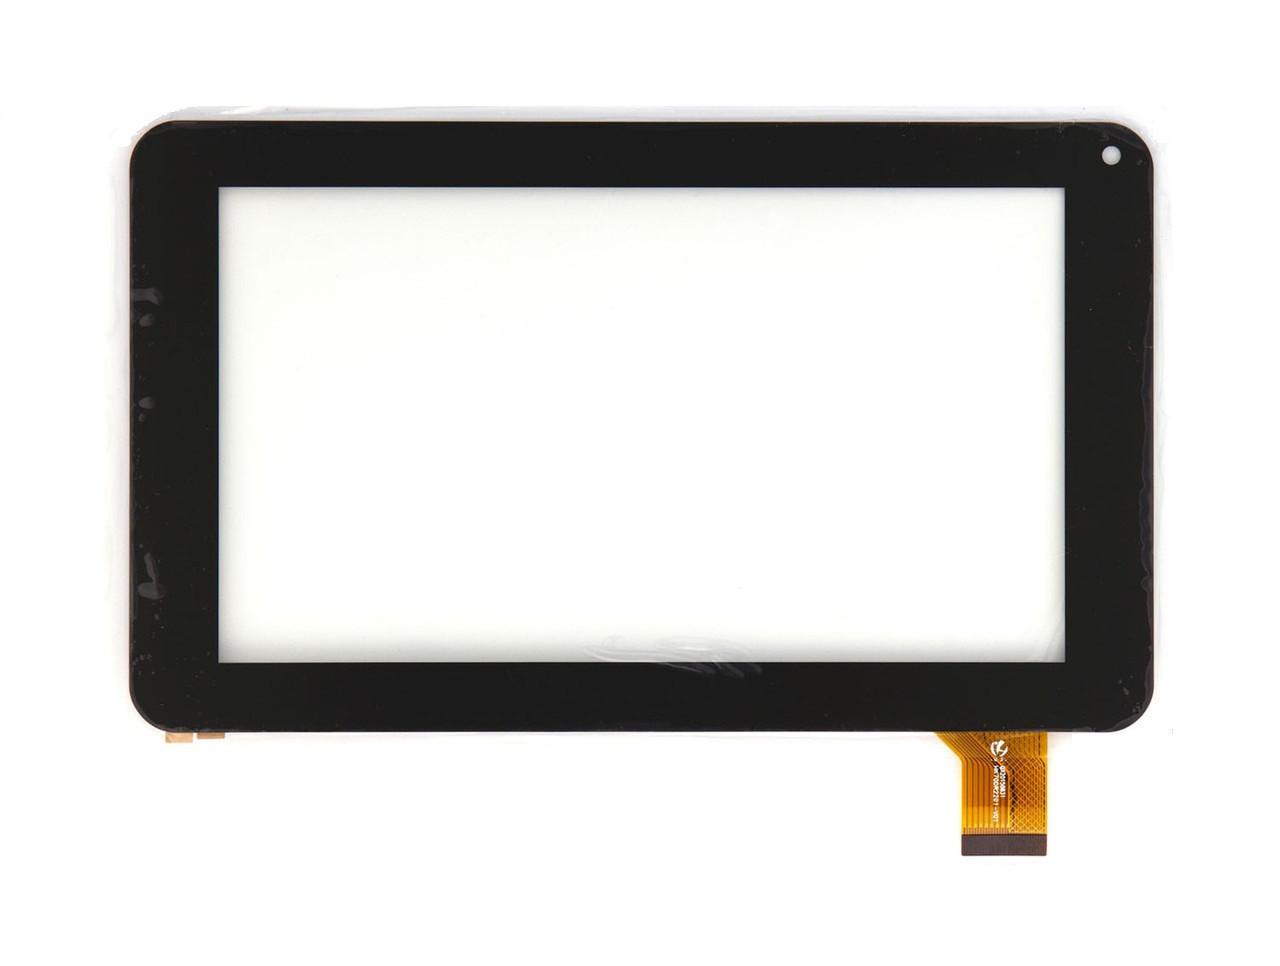 "Сенсор (Тачскрин) для планшета 7"" Pixus Play One (тип 1) (186*111 мм) 30pin (Черный) Оригинал Китай"